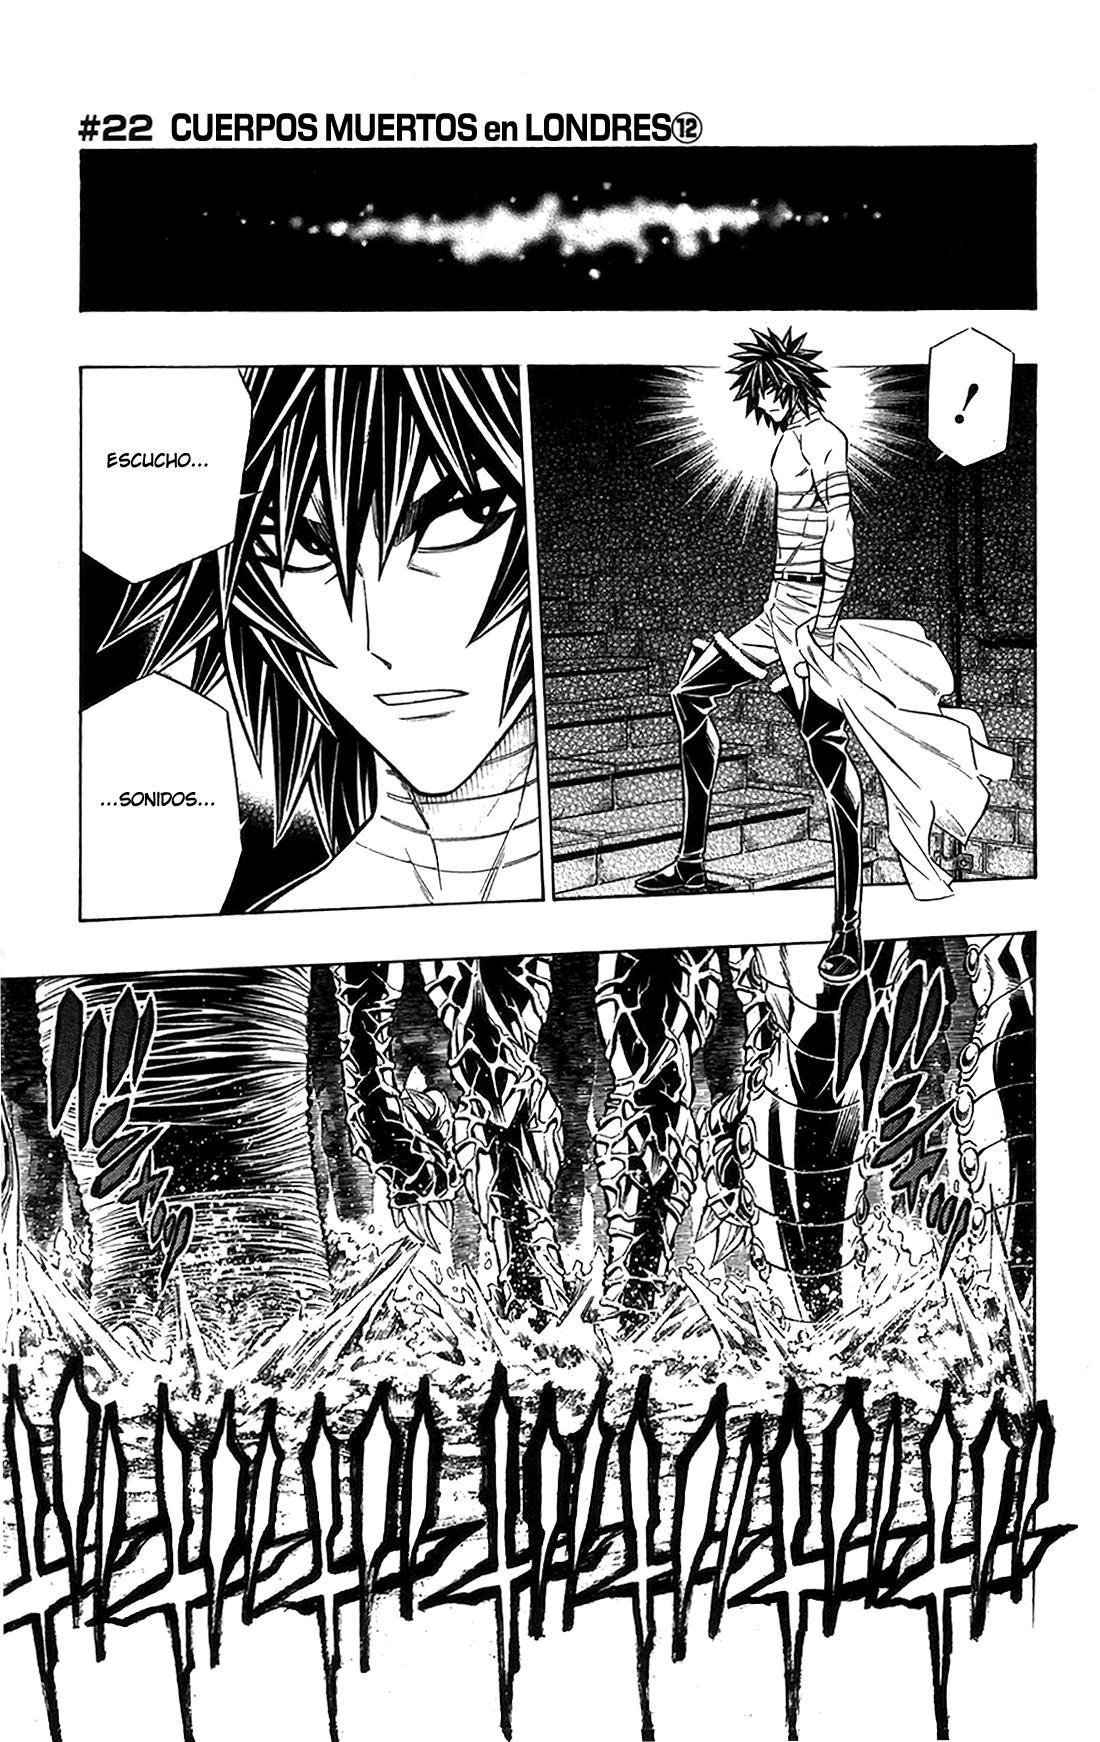 http://c5.ninemanga.com/es_manga/45/18797/447913/83a100ec3c2c30751156cea2d60aacbe.jpg Page 1